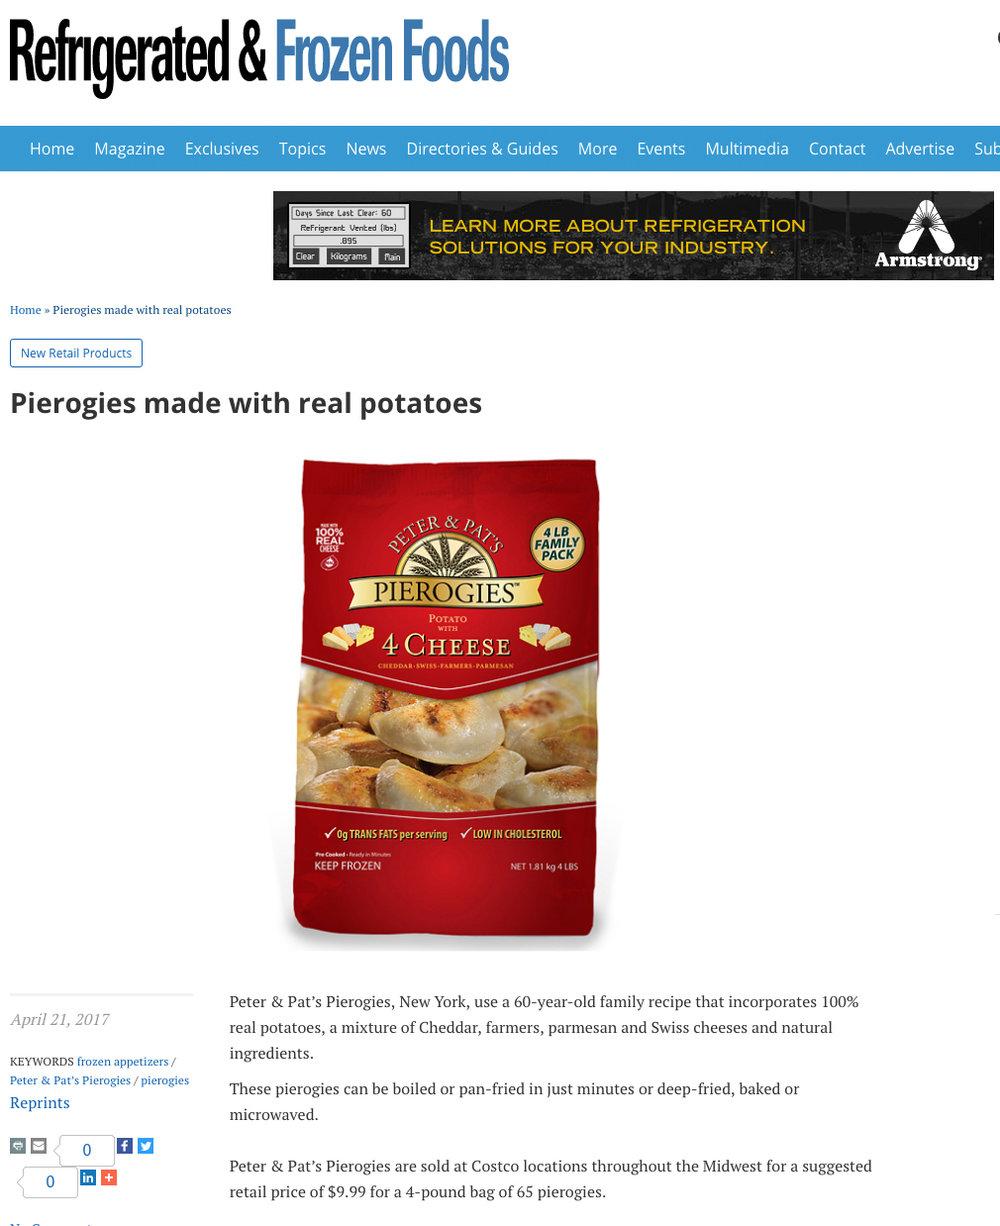 Peter & Pat's Pierogies featured in  Refrigerated & Frozen Foods